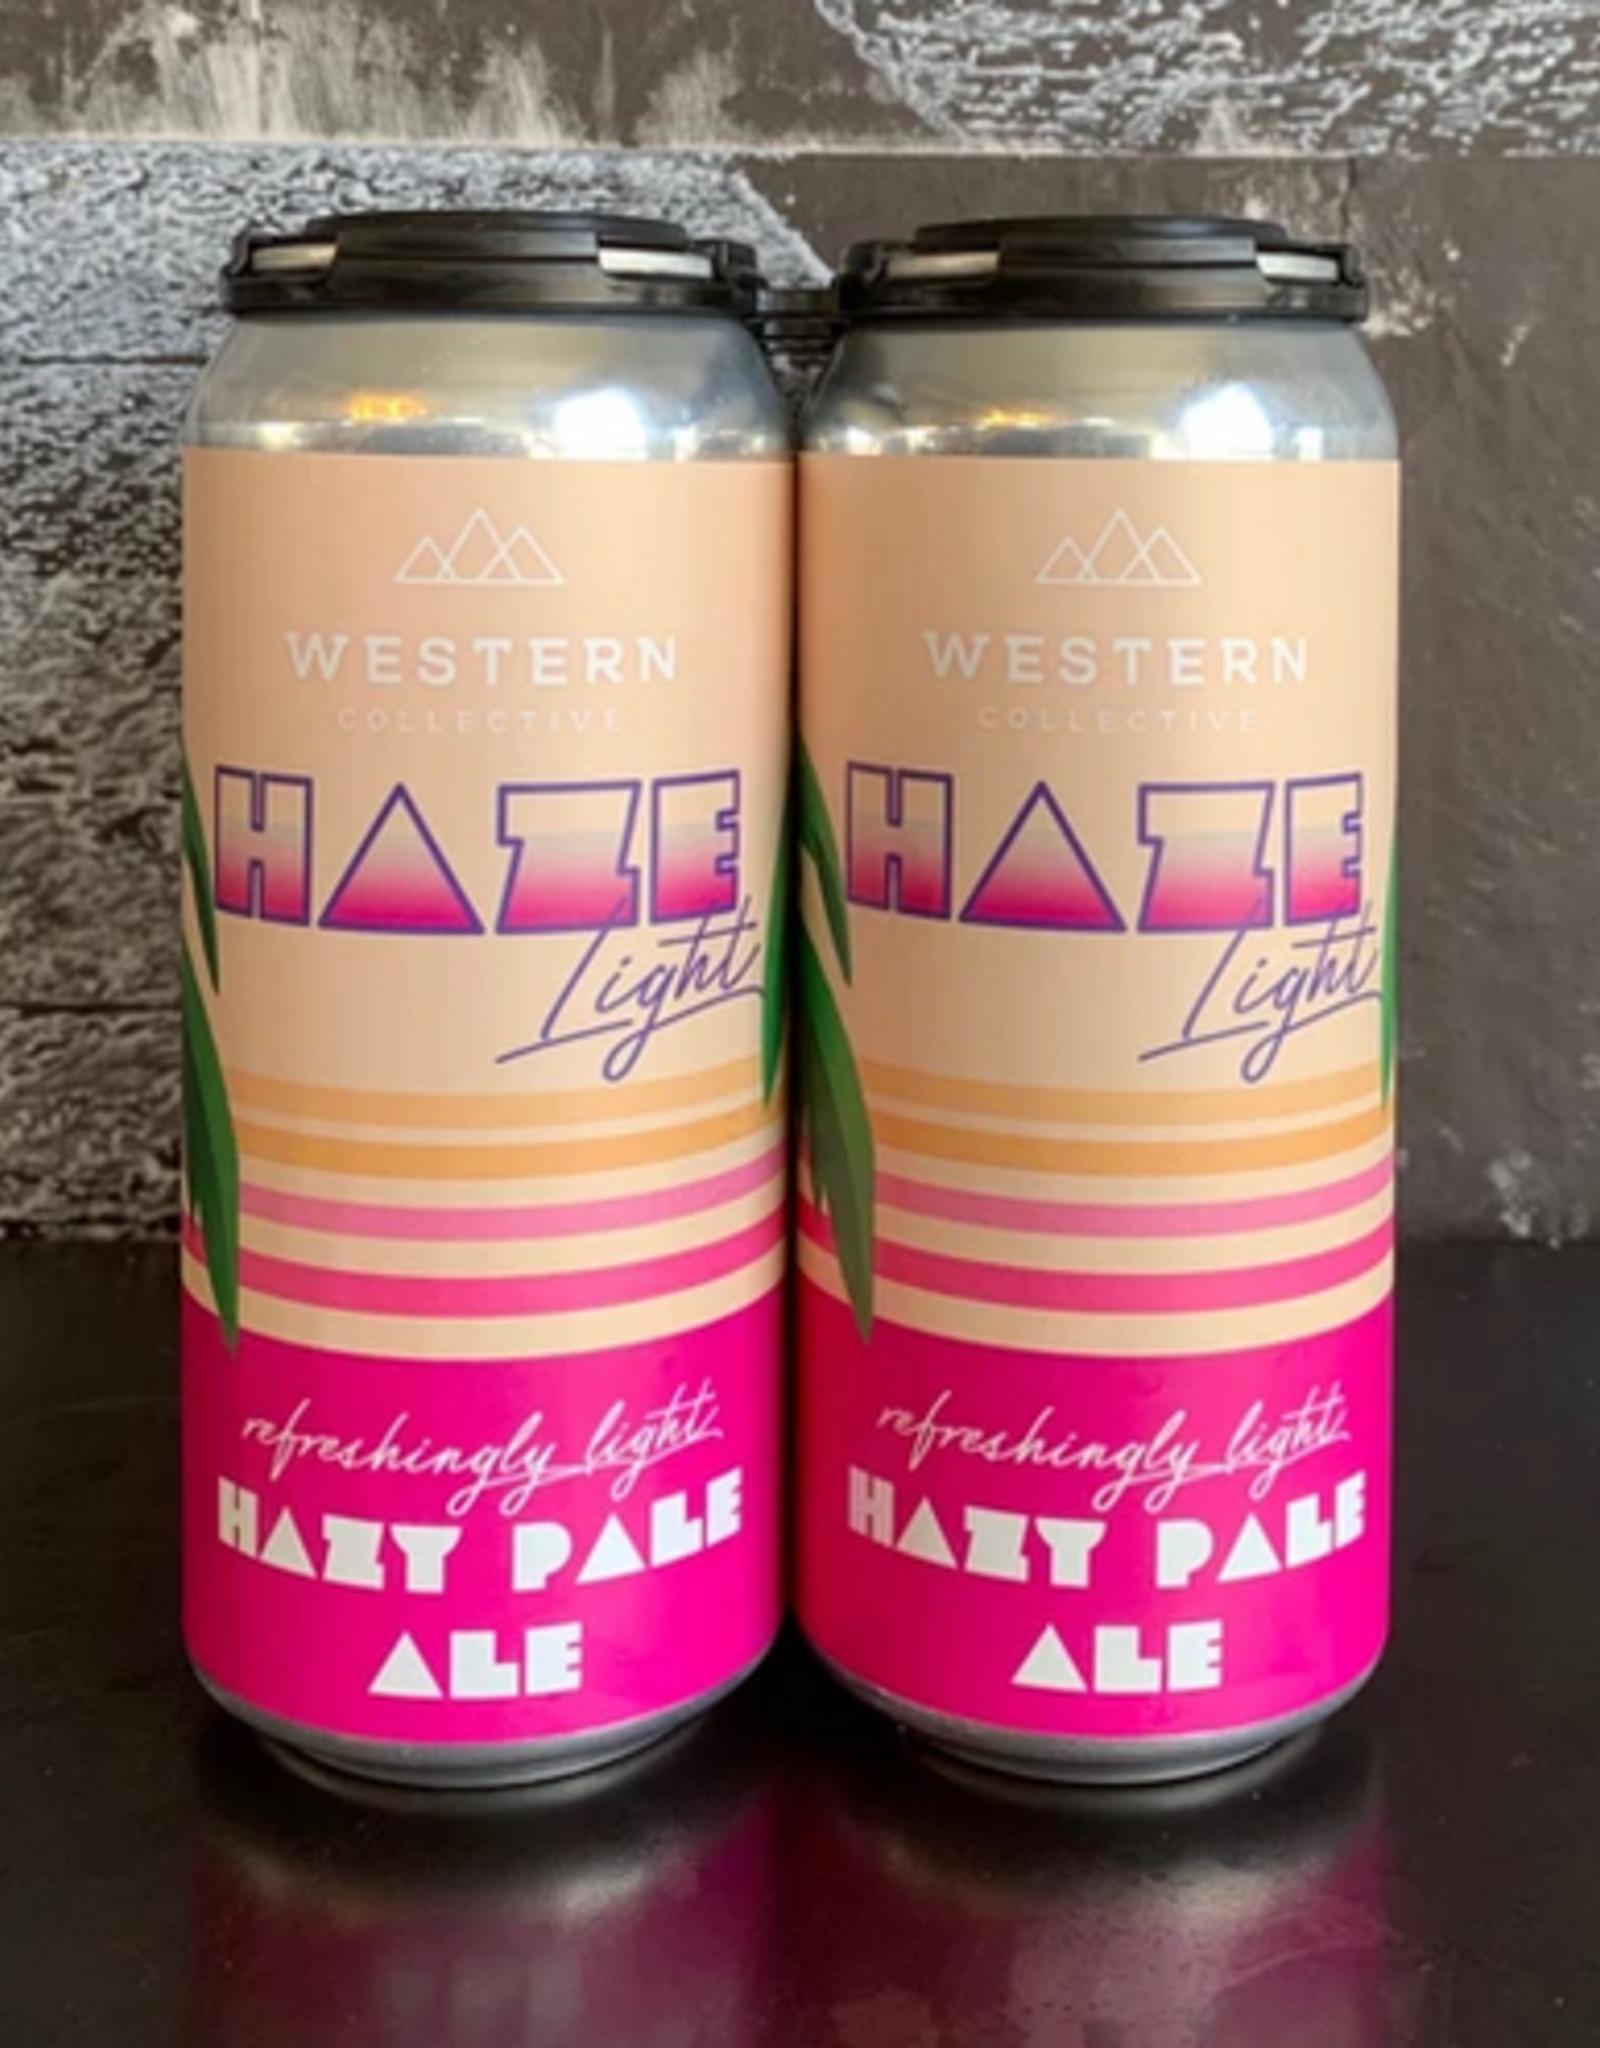 Hazy Pale Ale Western Collective Haze Light 6pk cans single